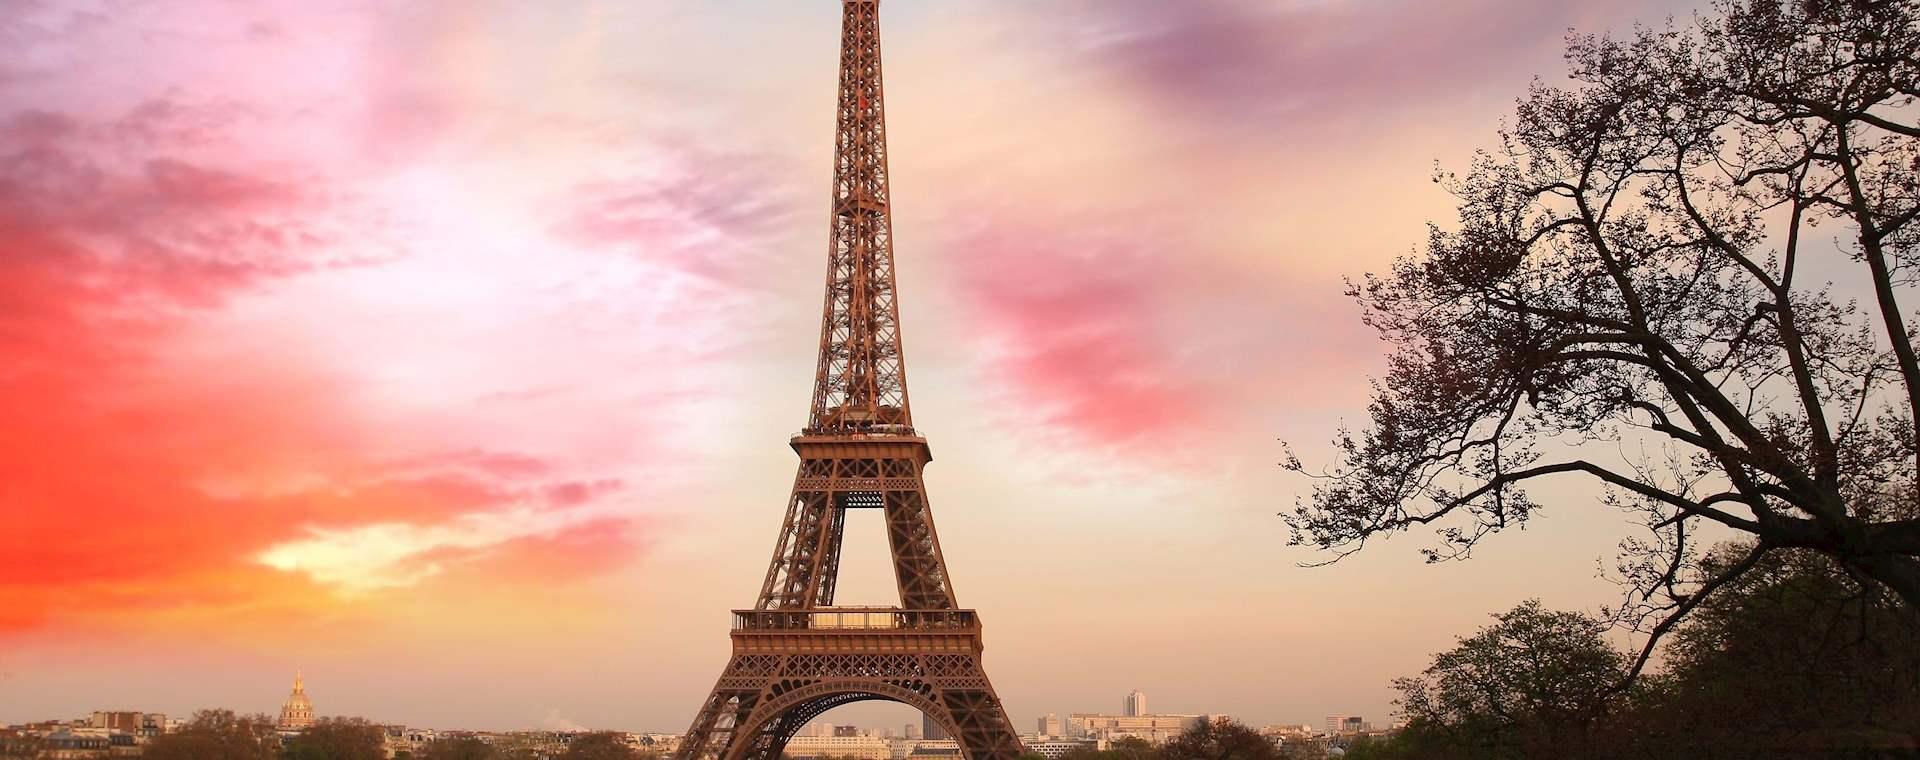 VIP Evening Eiffel Tower Tour & Seine Champagne Cruise